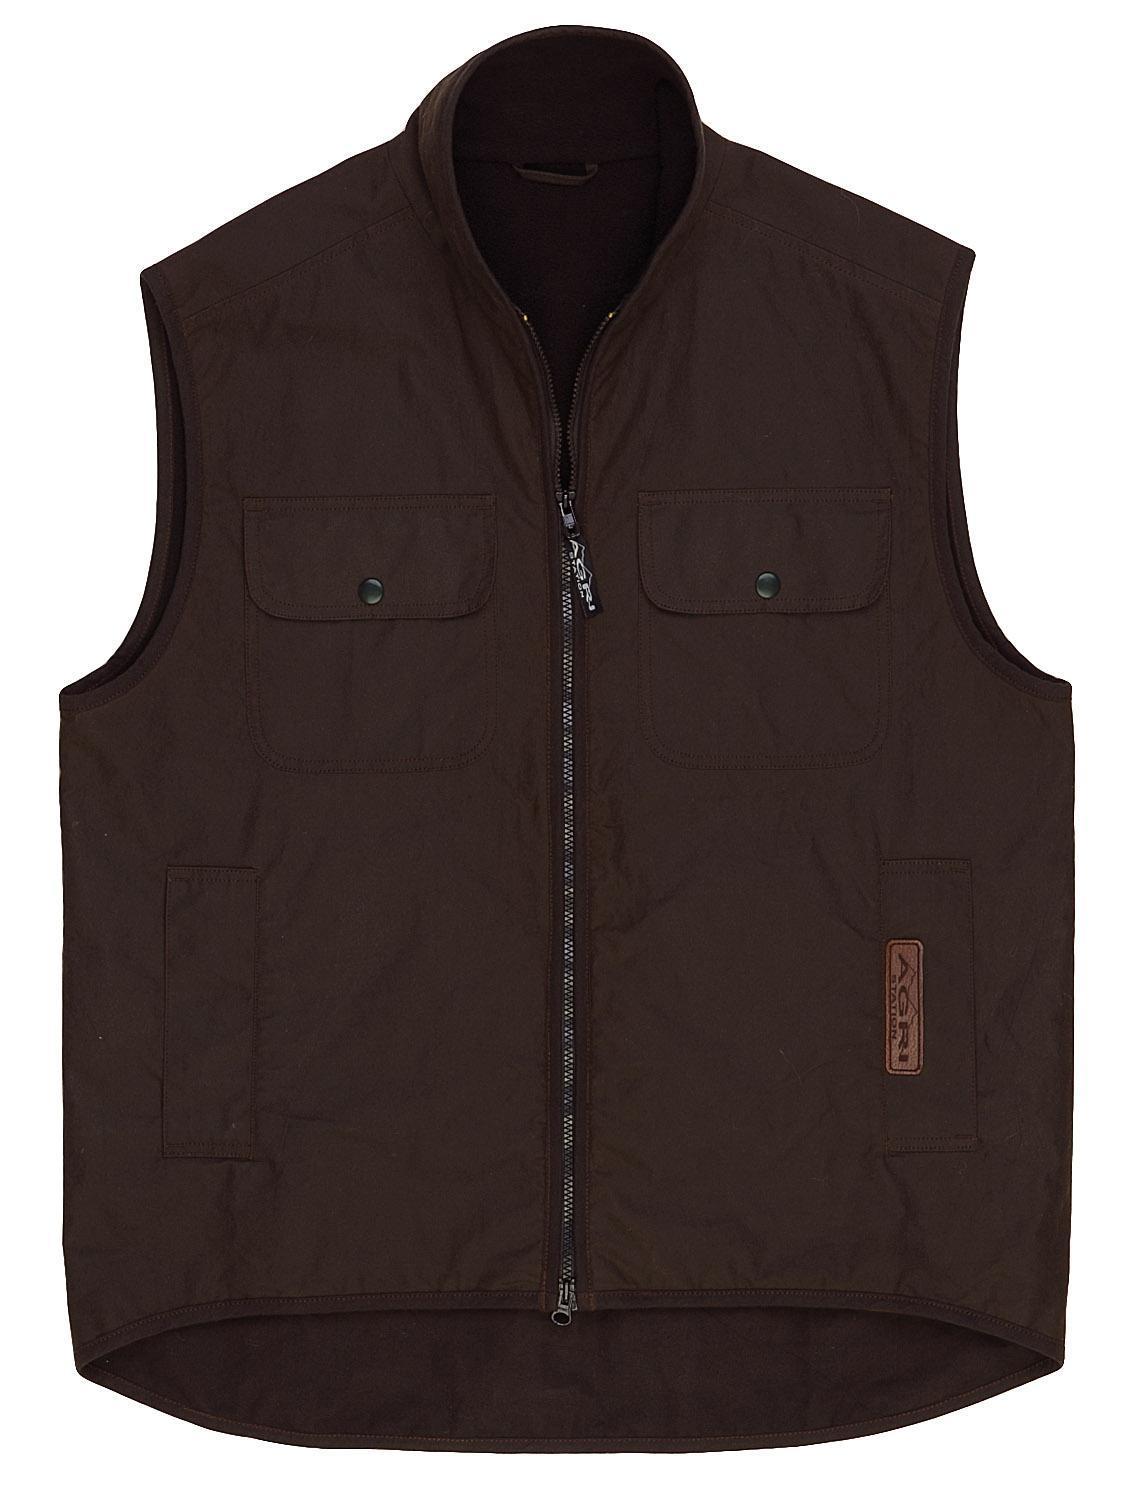 Vests Uniform 5